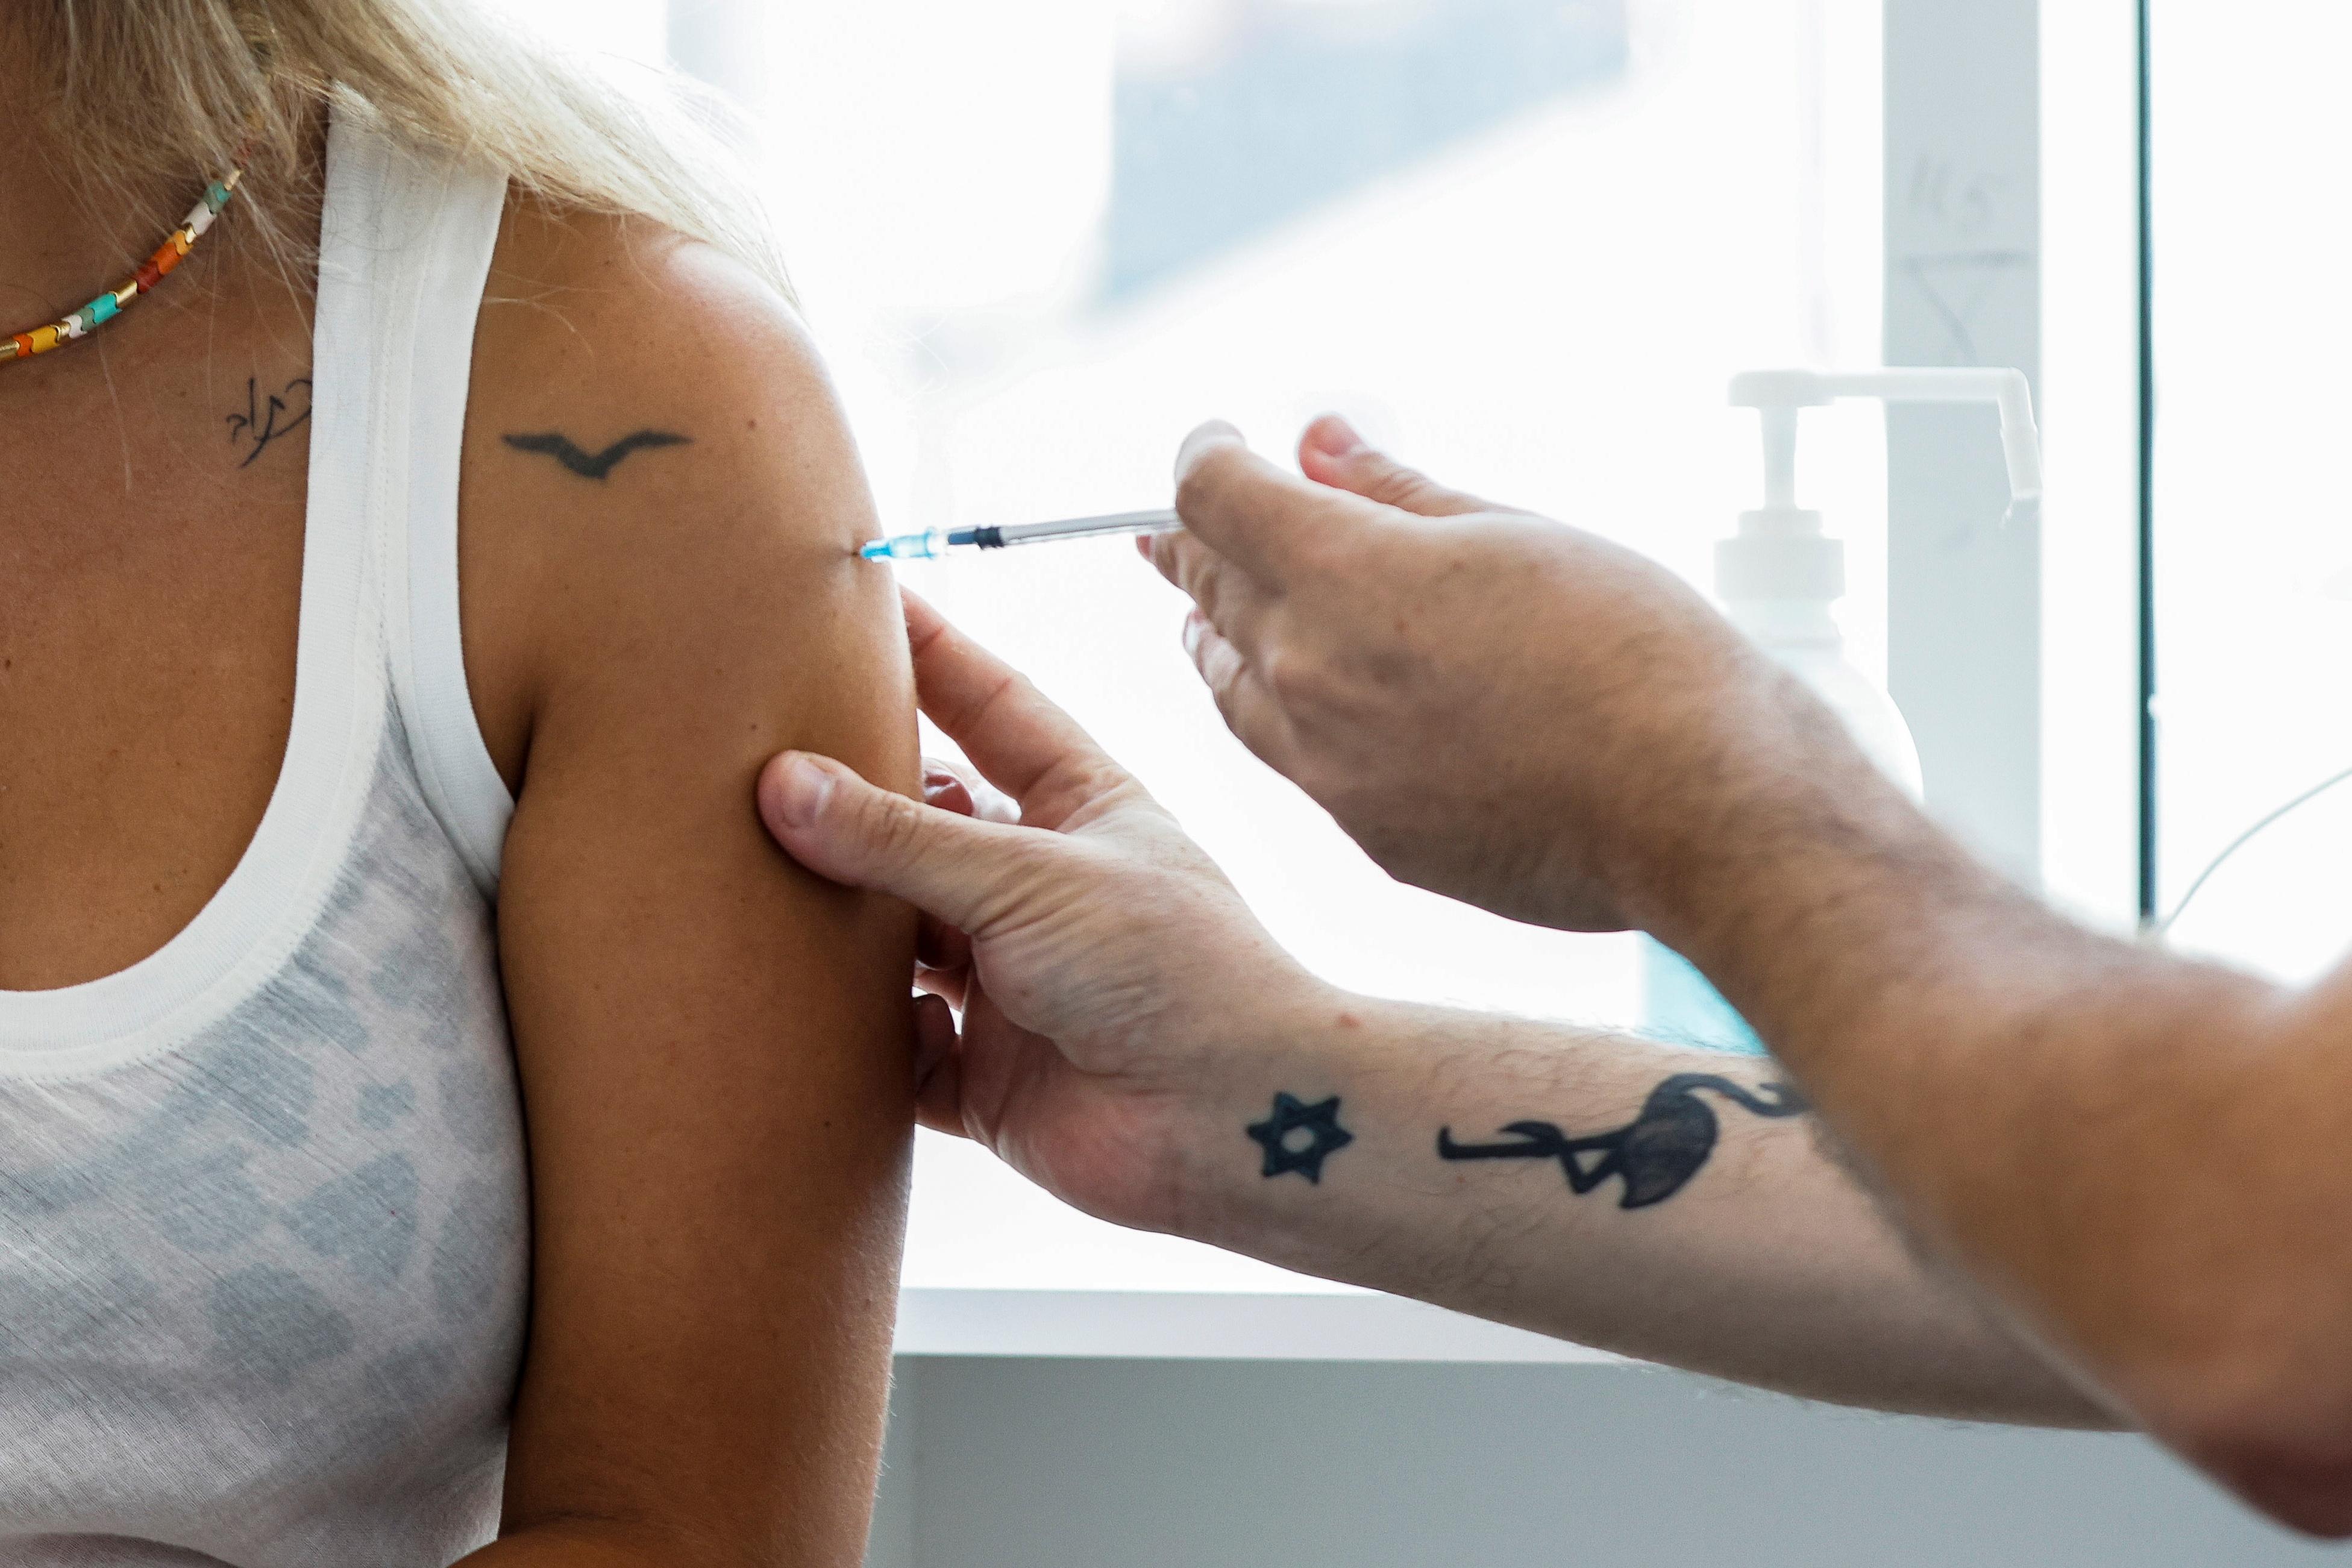 An Israeli woman receives a third shot of coronavirus disease (COVID-19) vaccine in Tel Aviv, Israel August 30, 2021. REUTERS/Amir Cohen